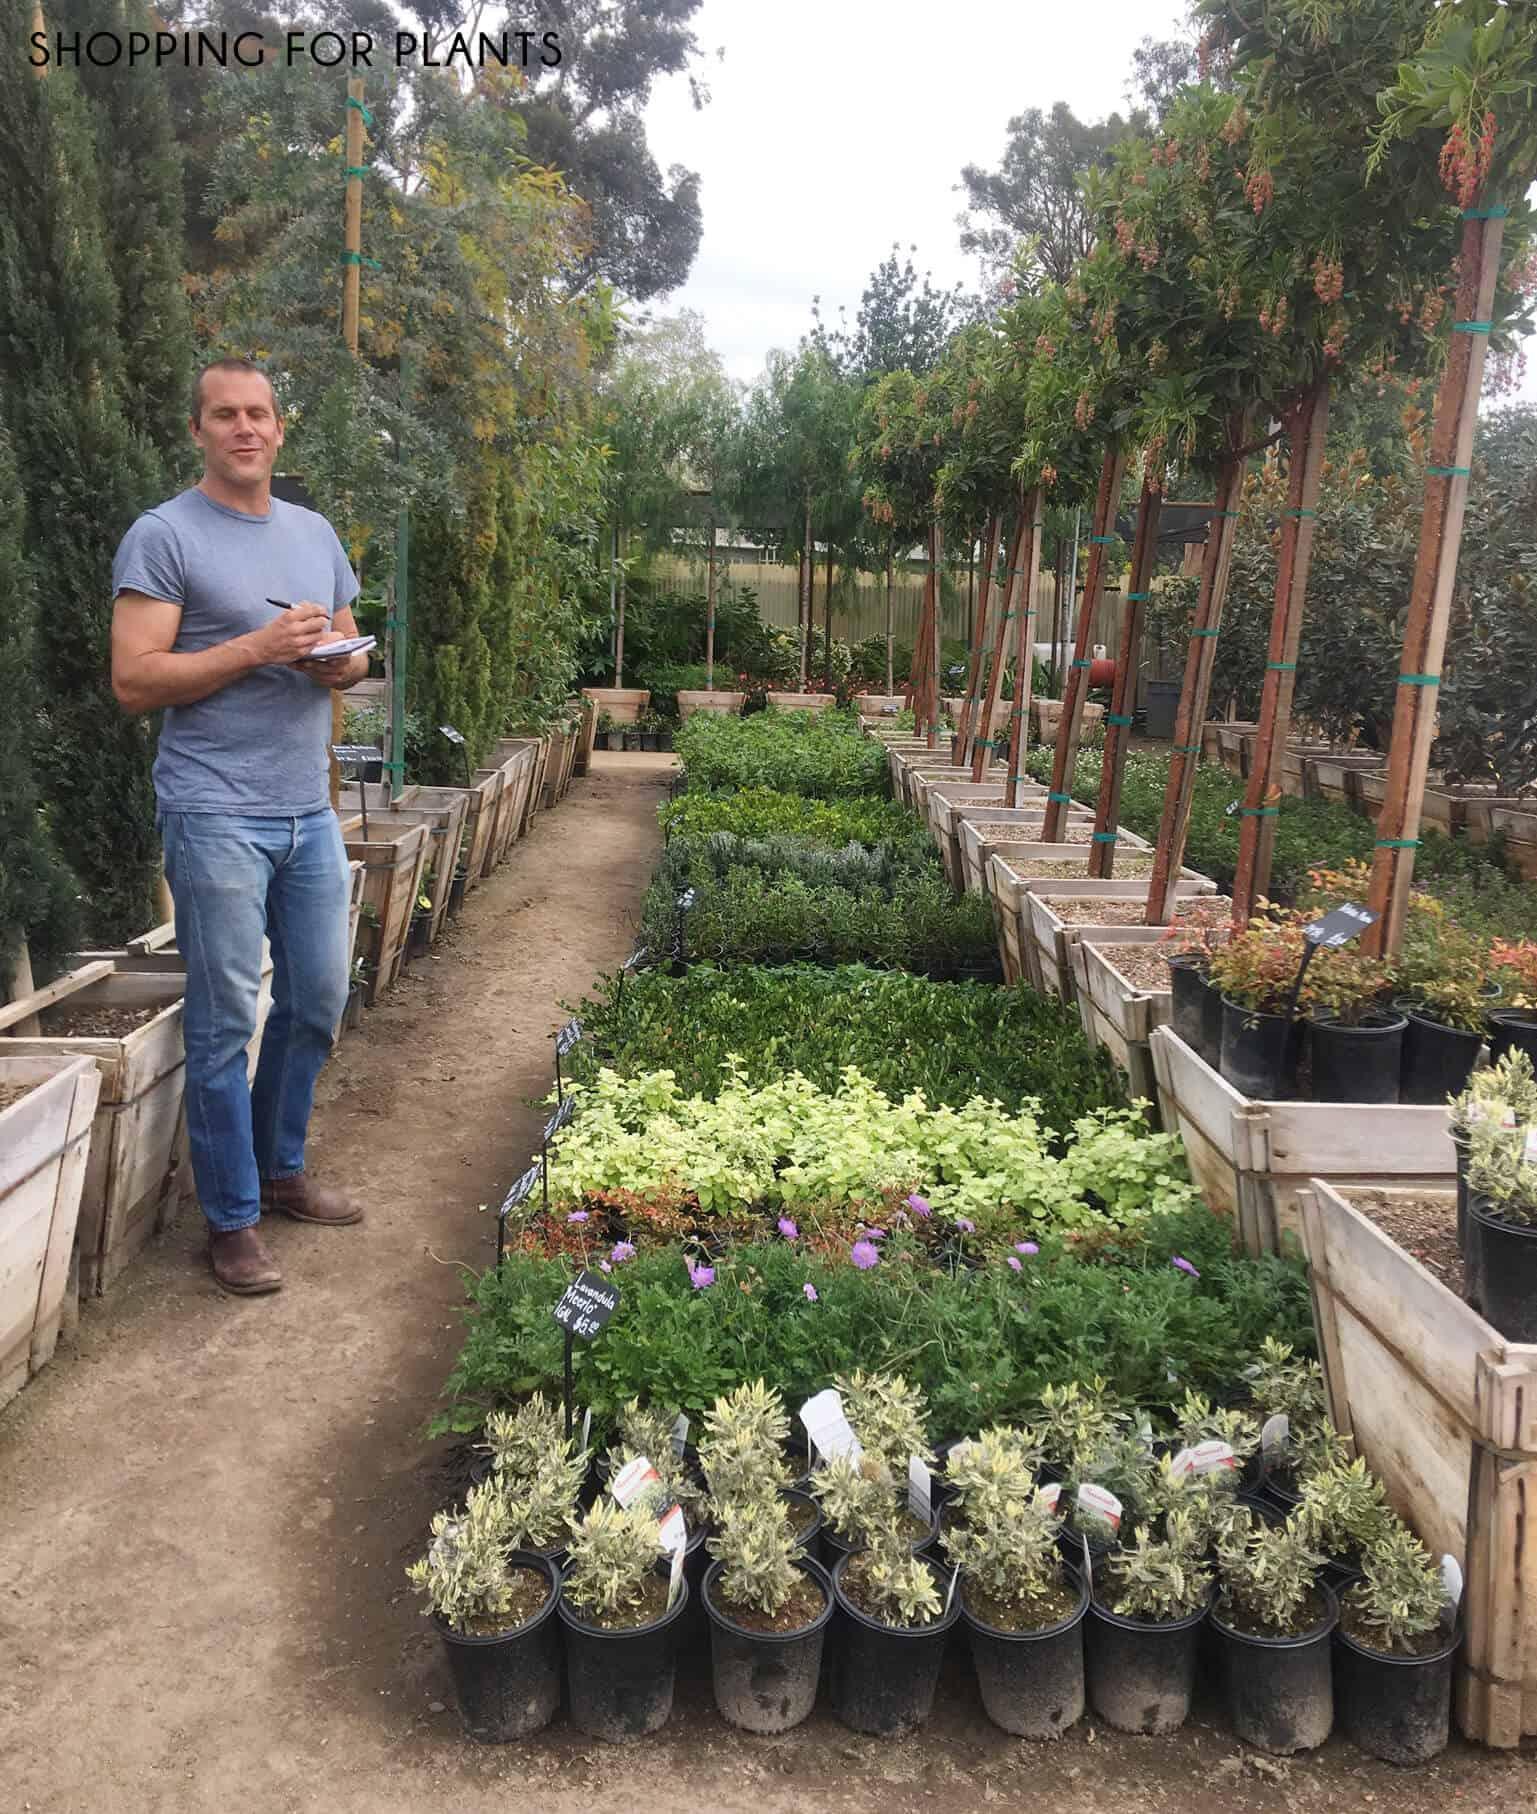 Emily-Henderson_Waverly_Modern-English-Cottage_Backyard_Plan-From-Gardener_Shopping-for-Plants_2